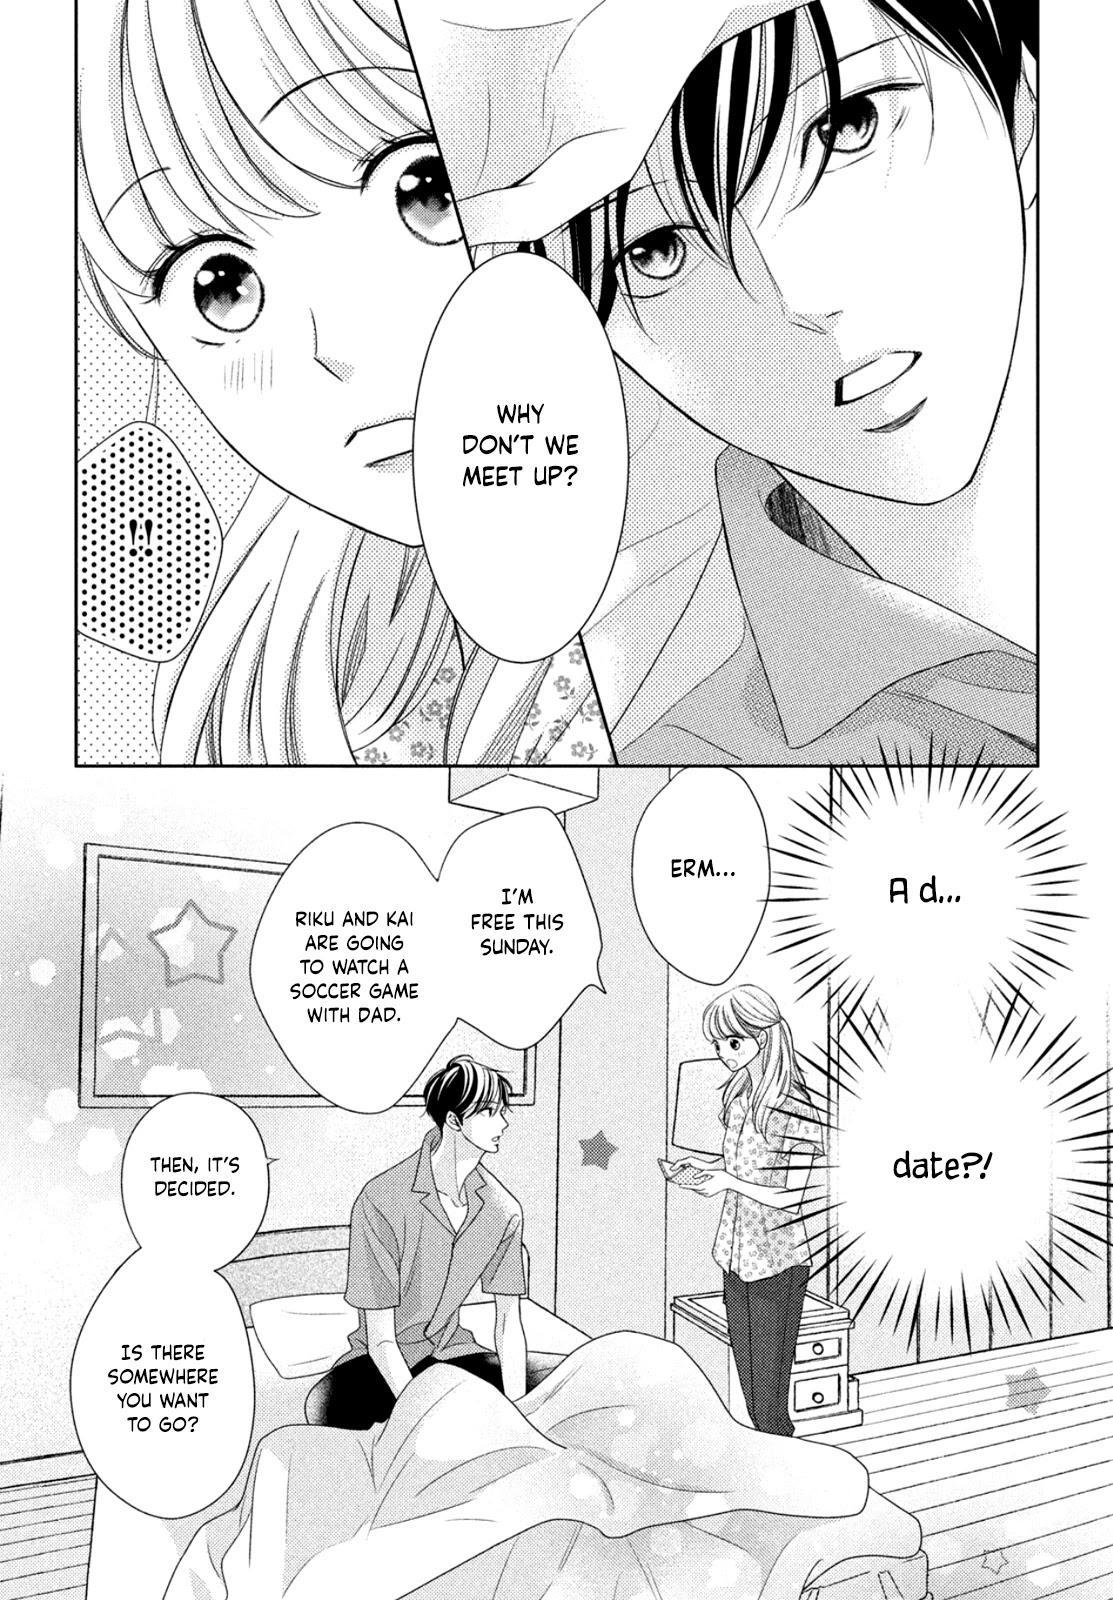 Arashi-Kun No Dakimakura Chapter 7: Because We're The Same page 7 - Mangakakalots.com